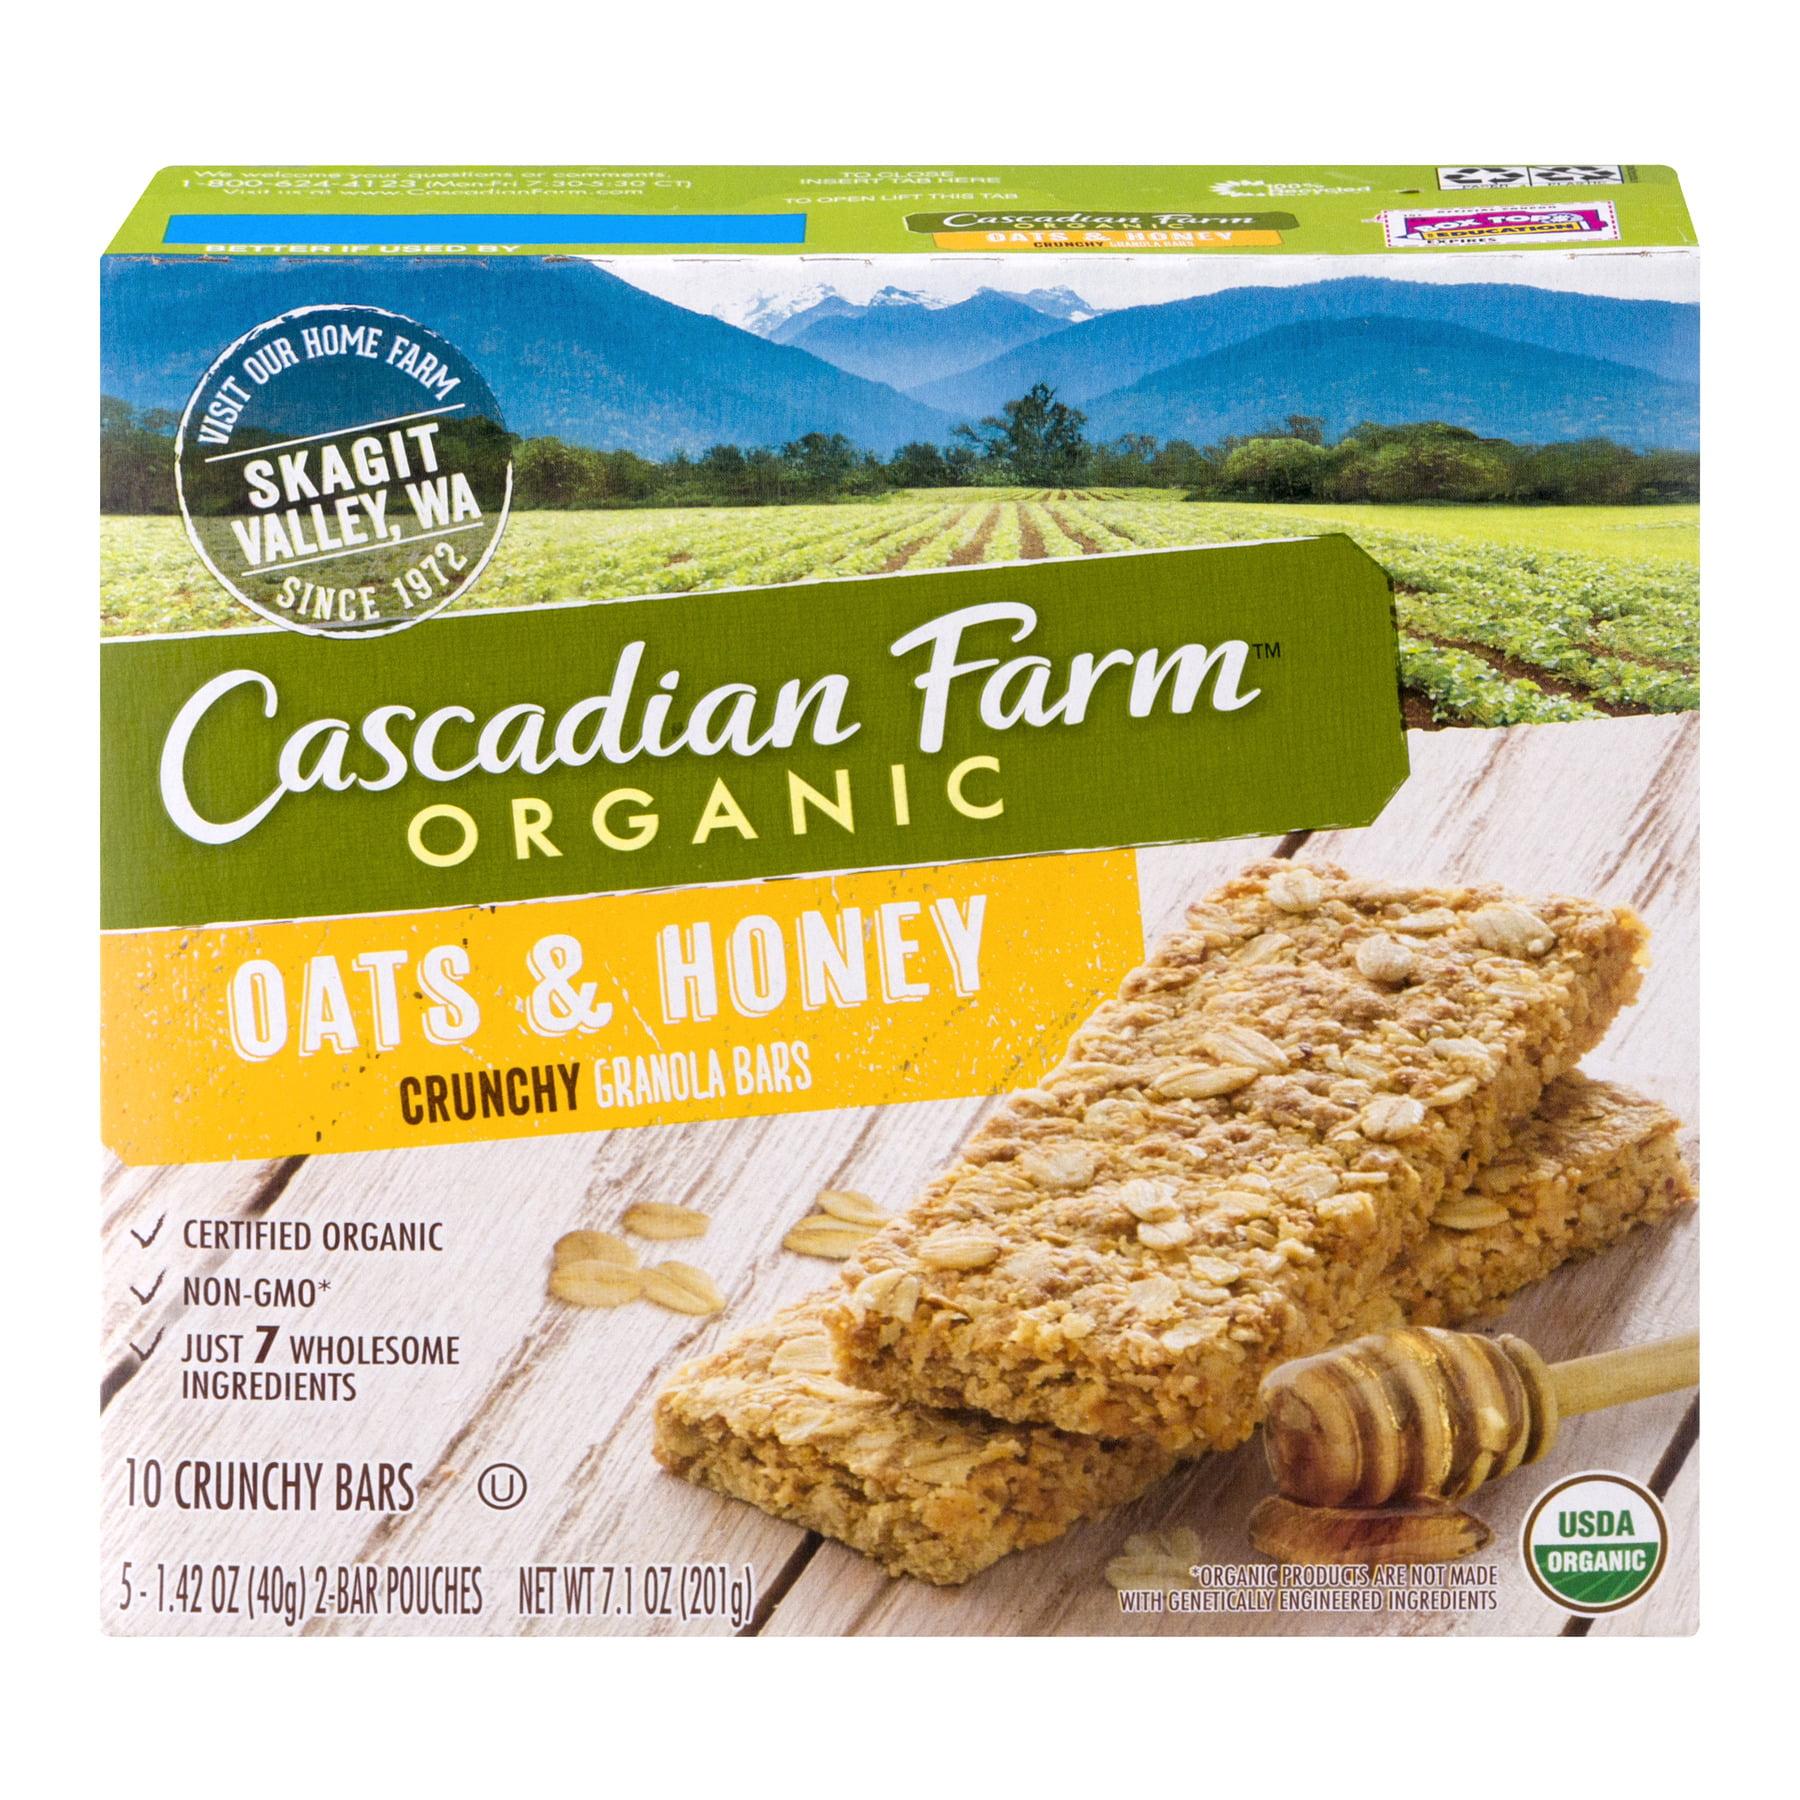 Cascadian Farm Organic Granola Bars Oats & Honey Crunchy Granola Bars